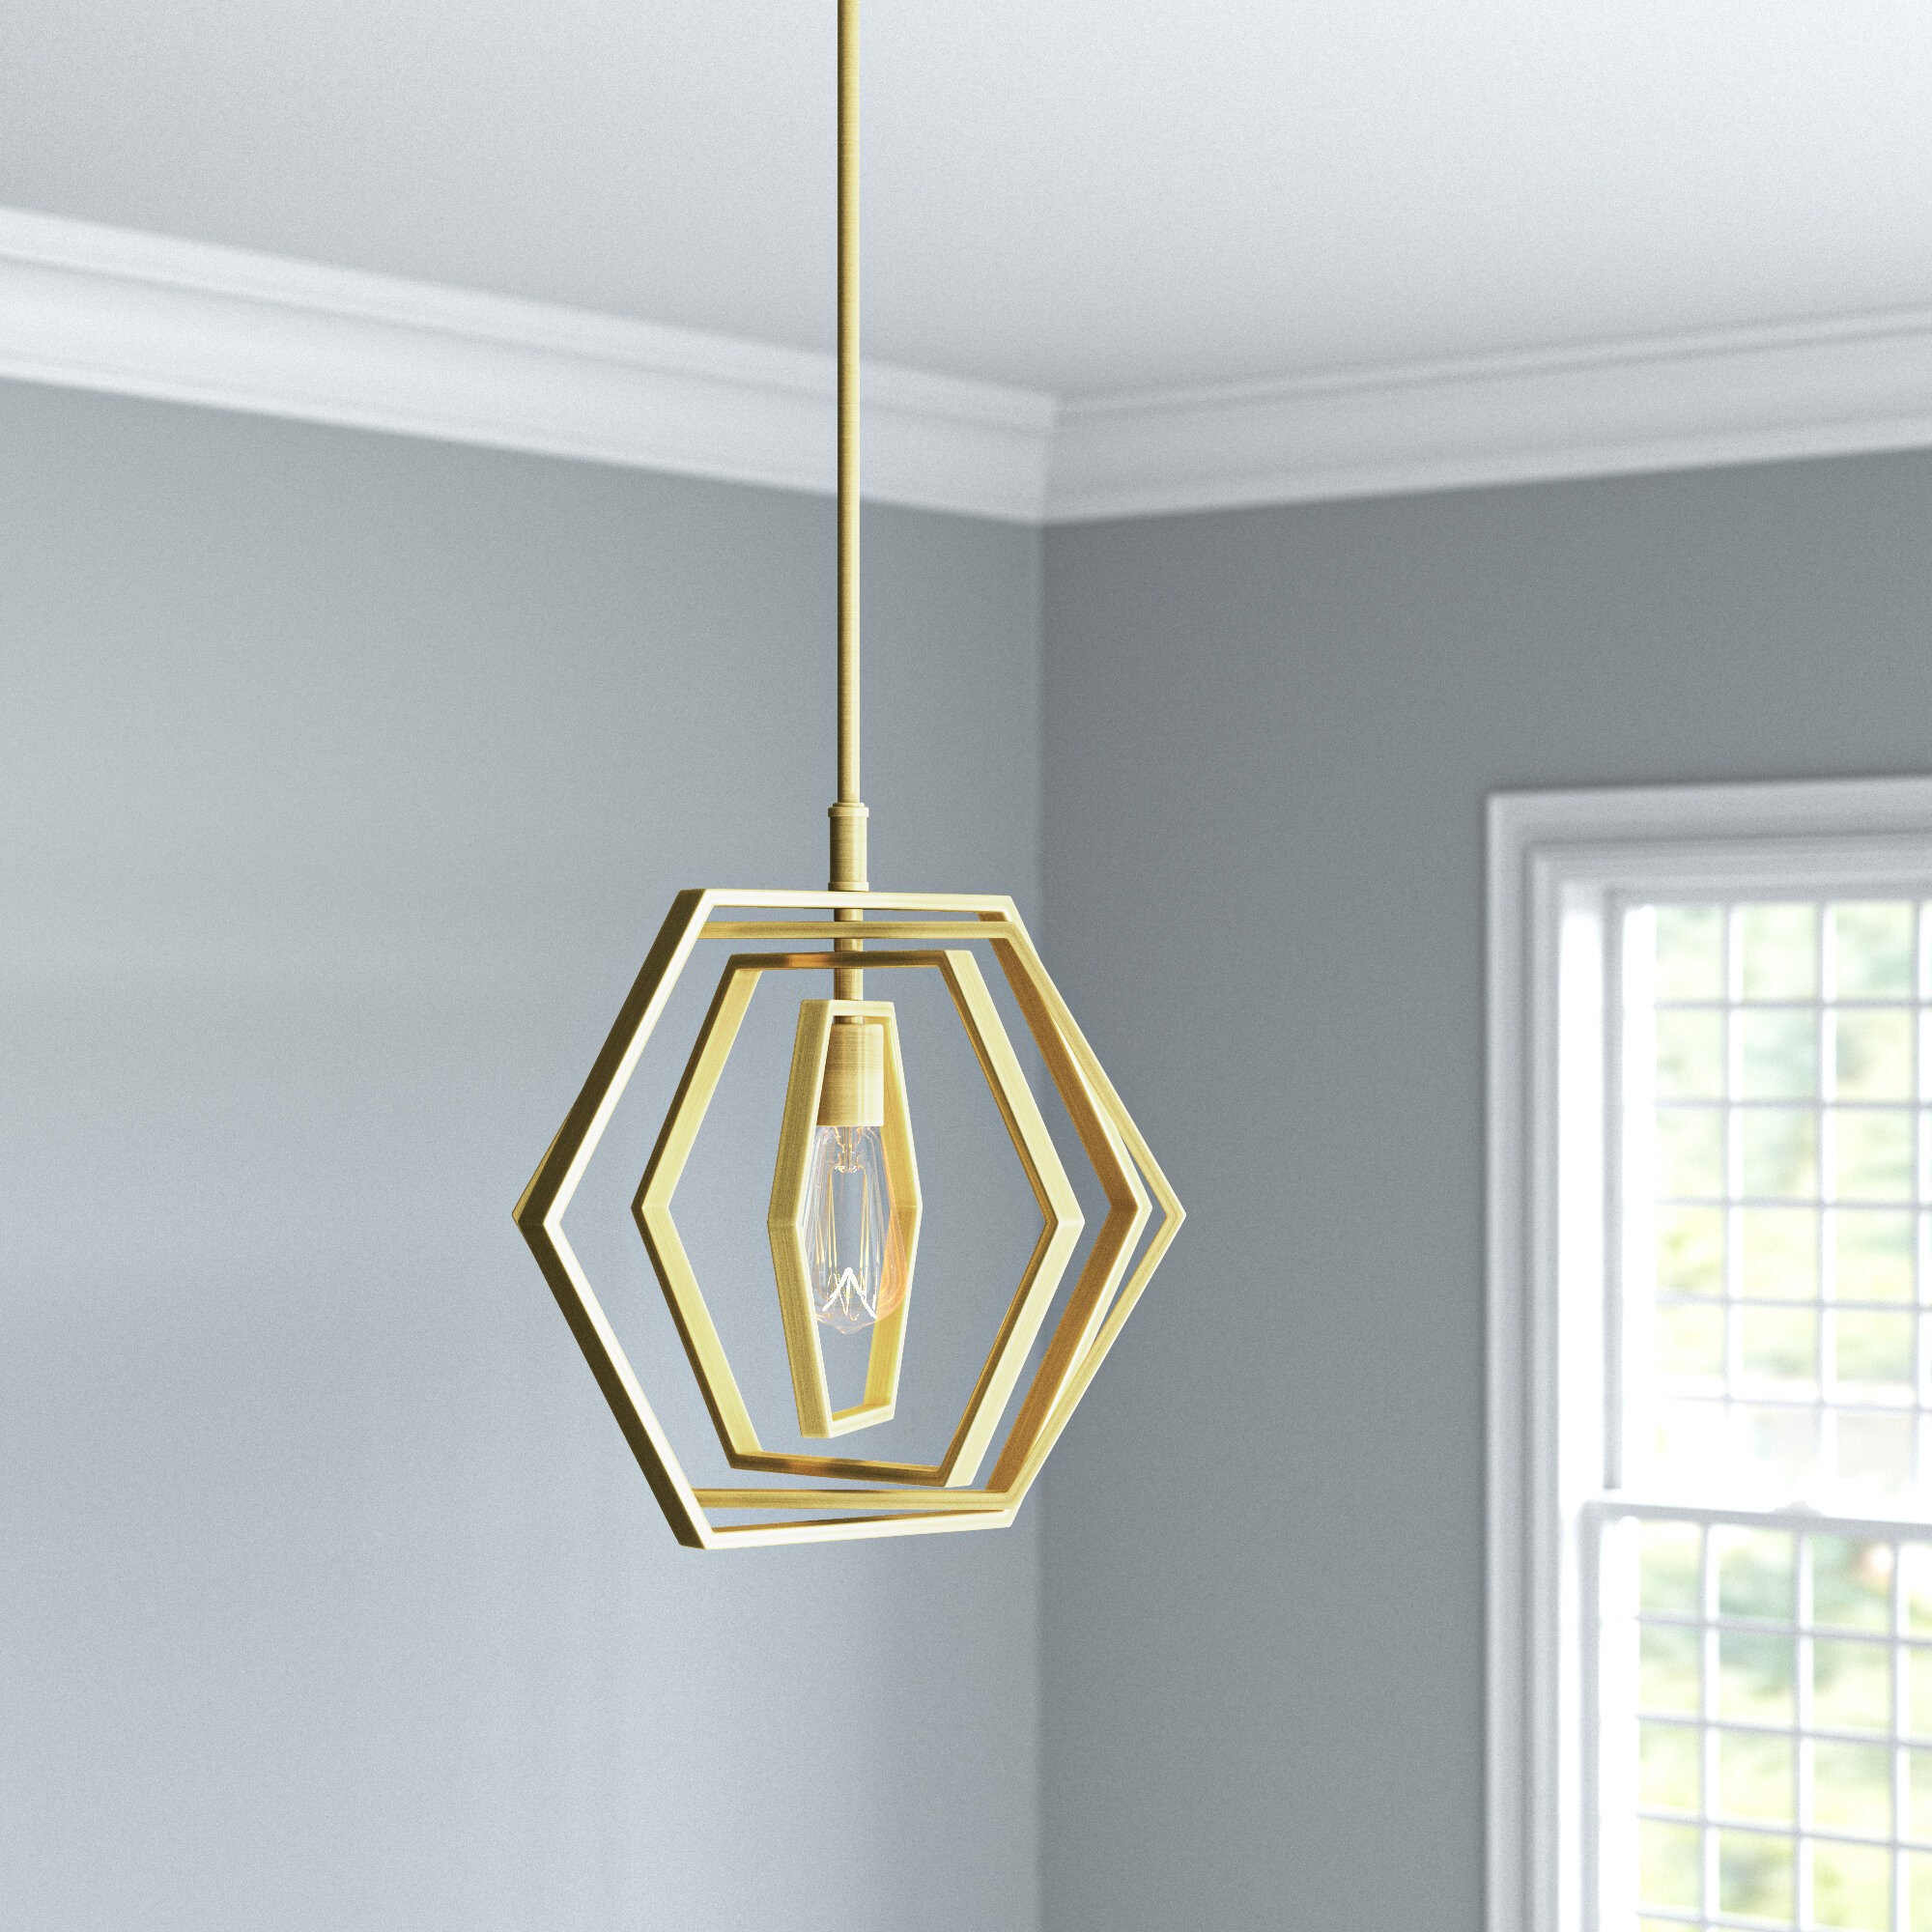 Mercer41 Vandemark 1 Light Single Geometric Pendant Reviews Wayfair